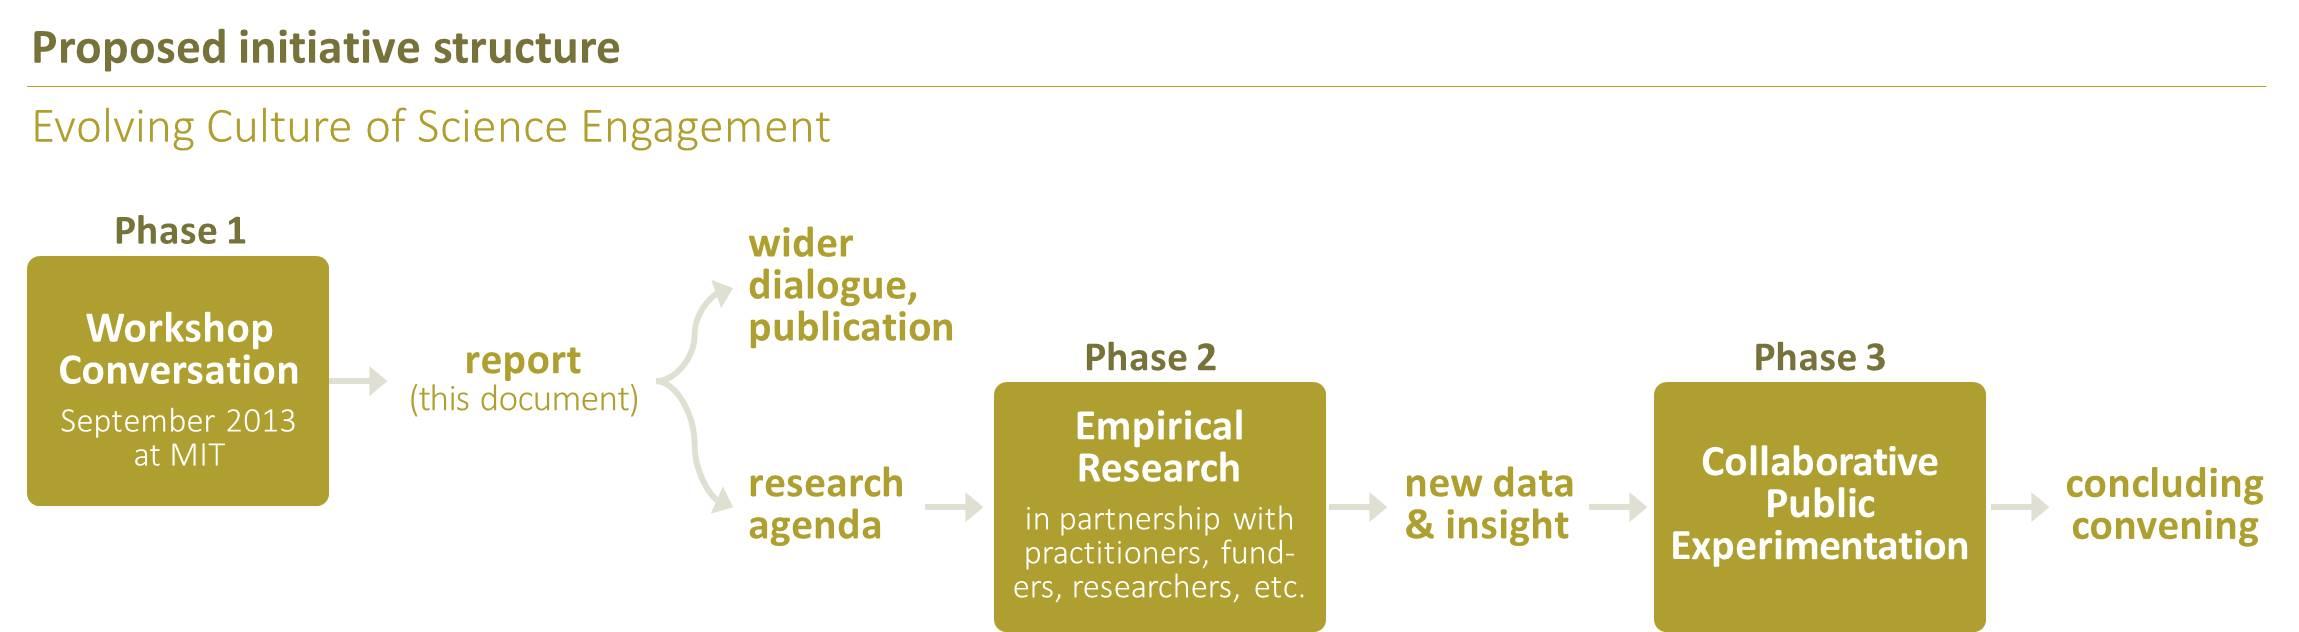 ECSE initiative potential structure diagram.jpg